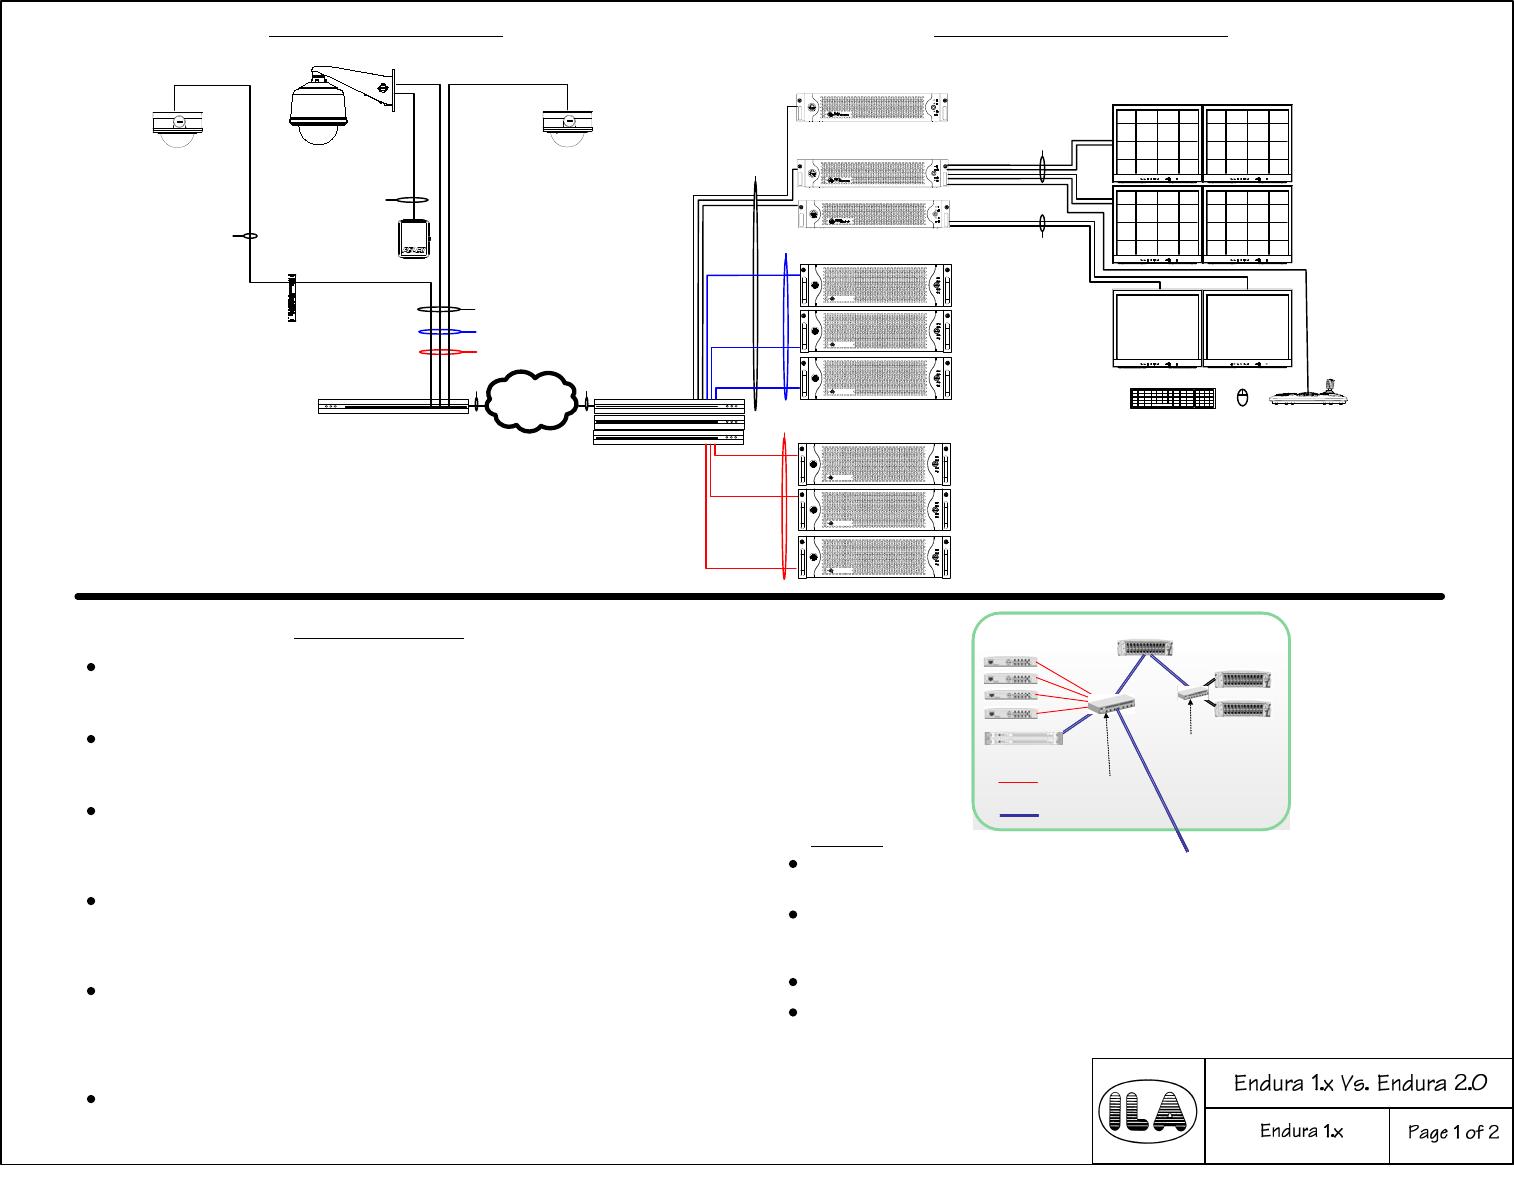 Visio Endura 1.x Vs. 2.0 Pelco Power Supply DAS5200 System